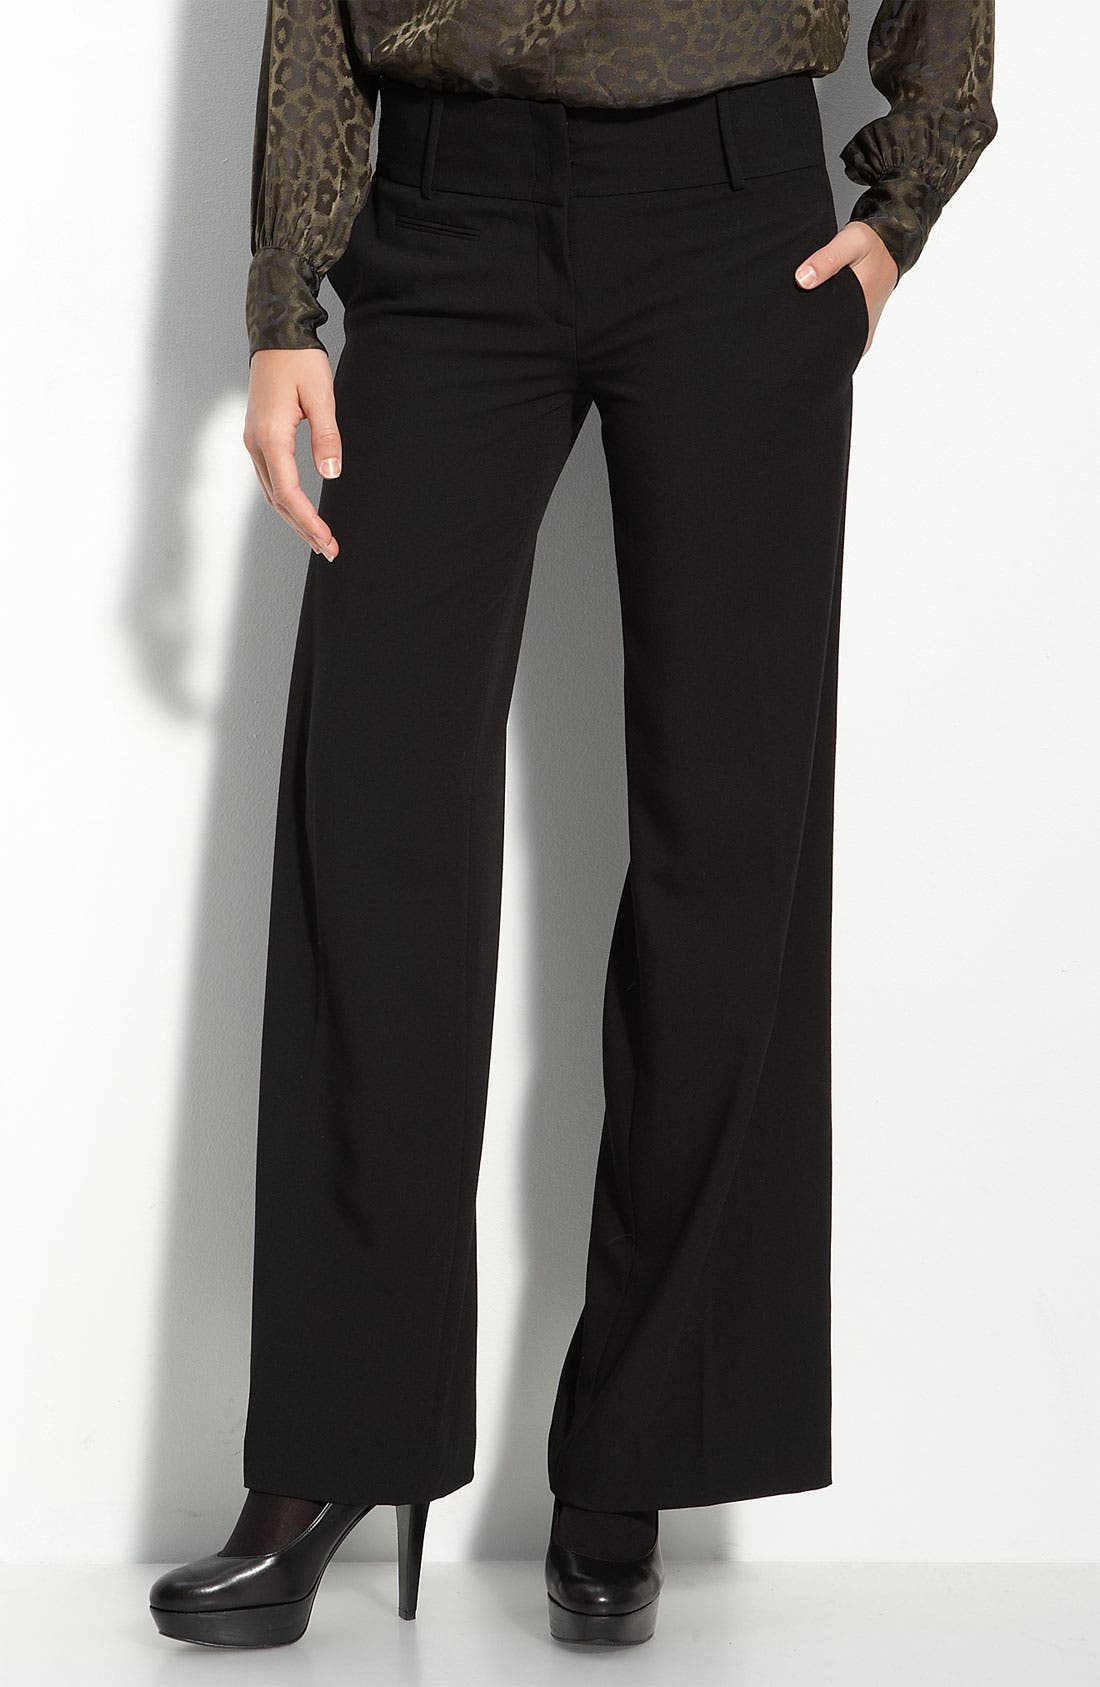 Alternate Image 1 Selected - BCBGMAXAZRIA Wide Leg Trousers